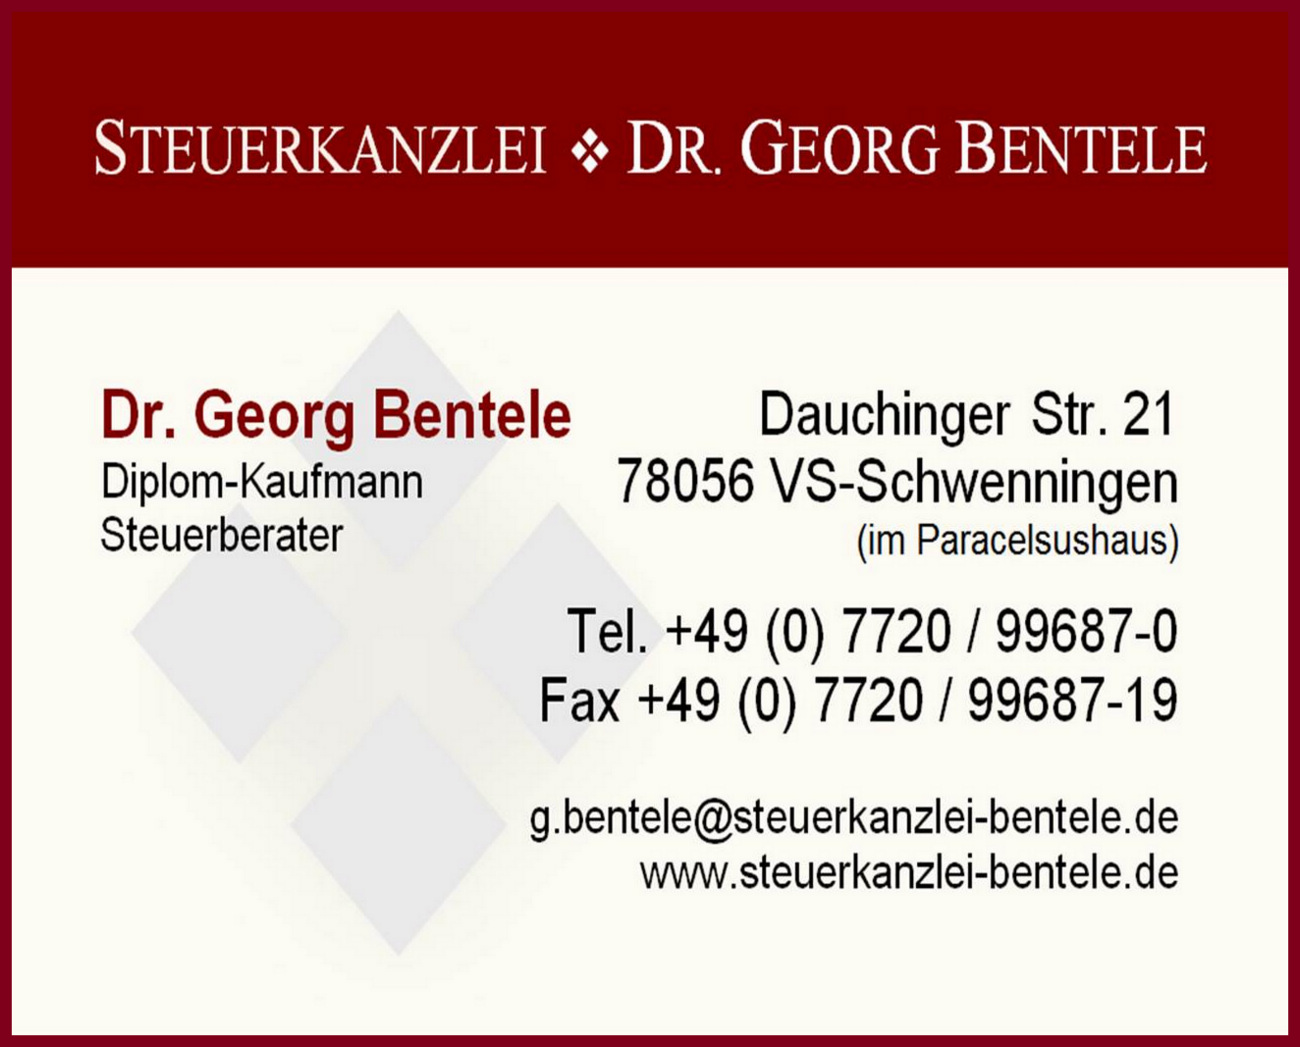 Steuerkanzlei Dr. Georg Bentele